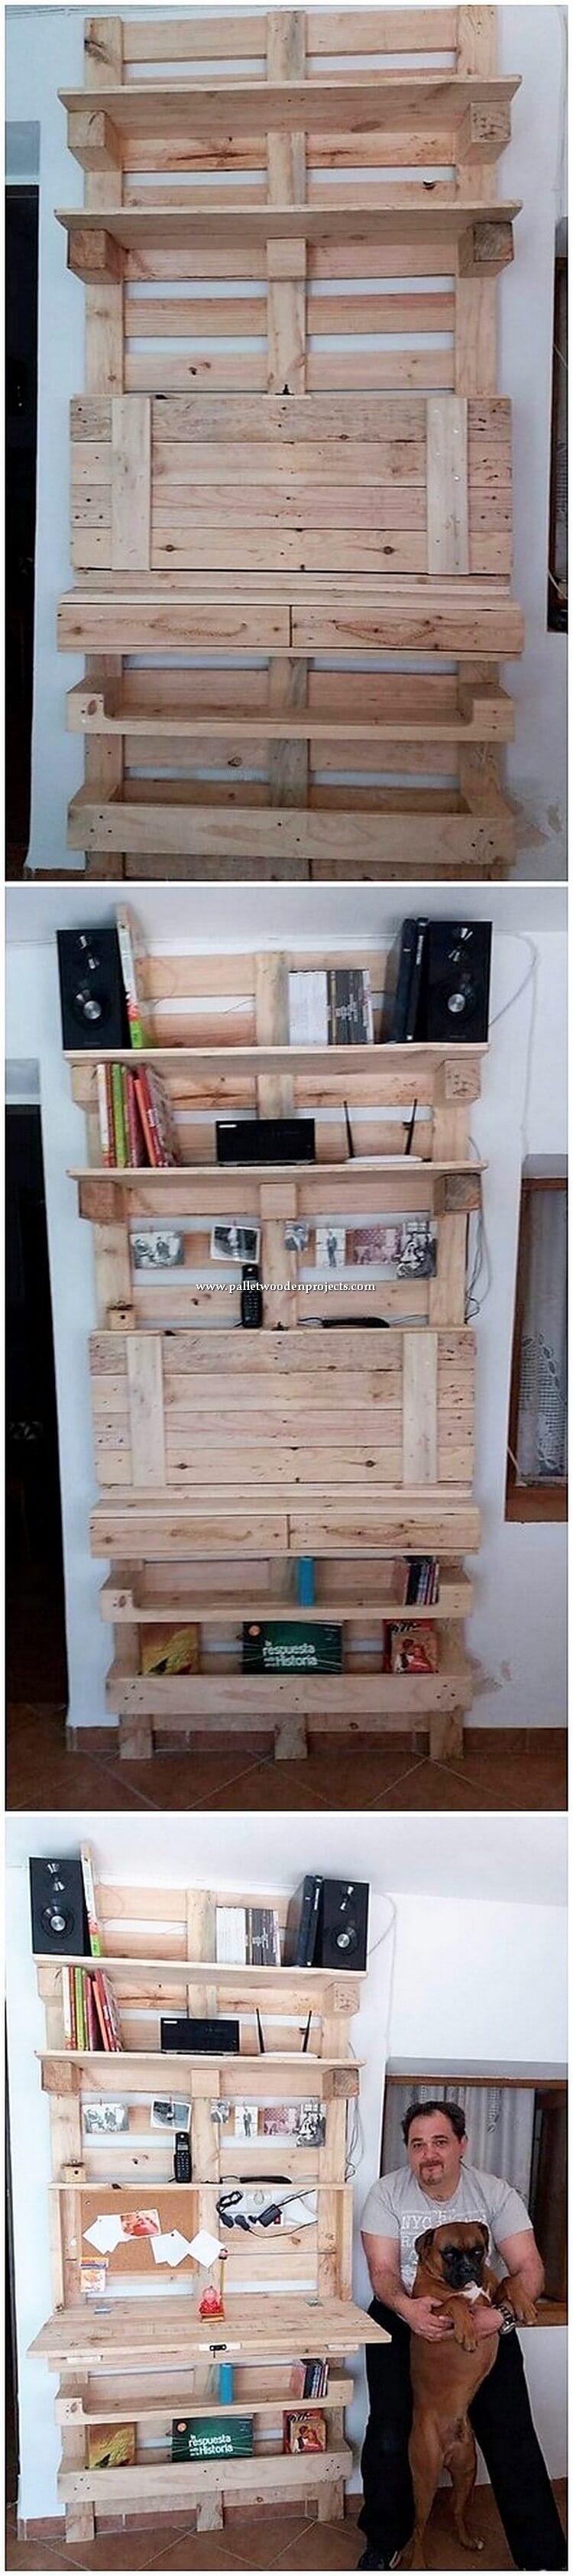 Pallet Shelving Unit with Folding Desk